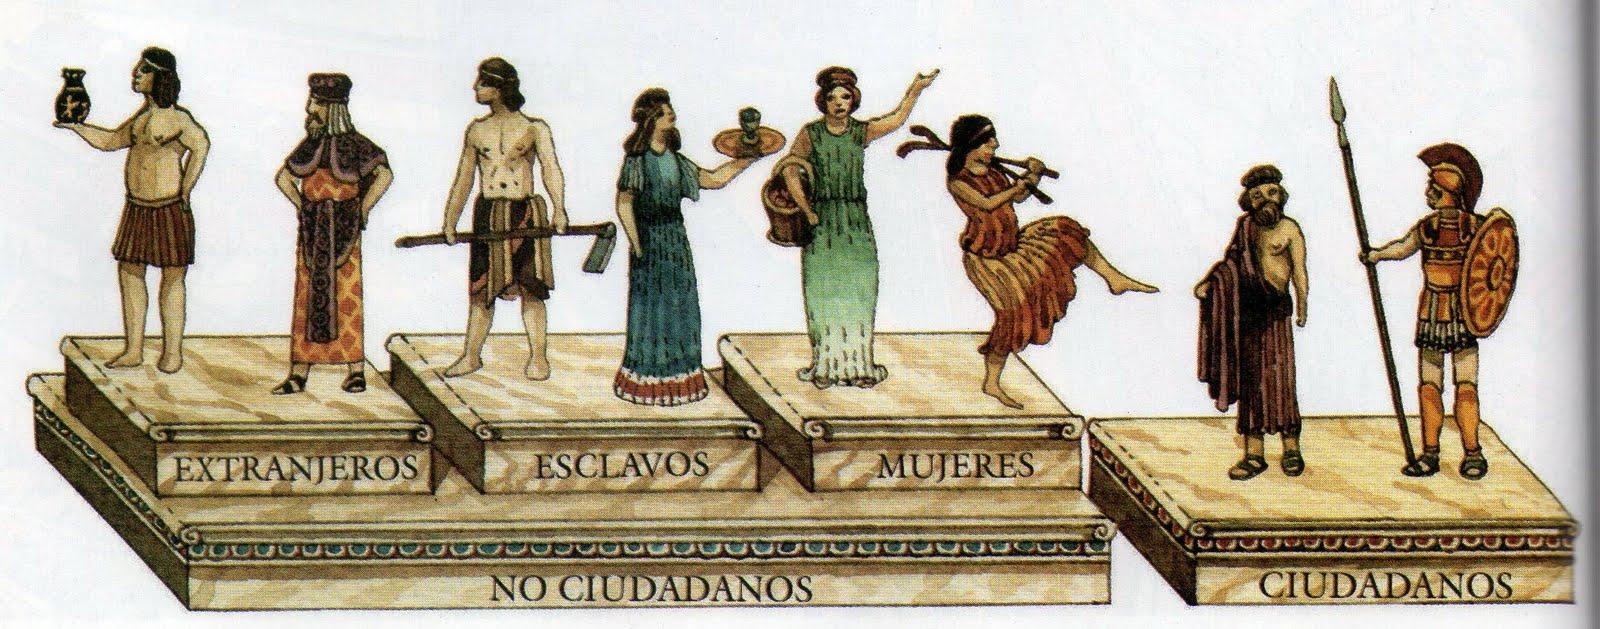 gobierno de la antigua atenas: